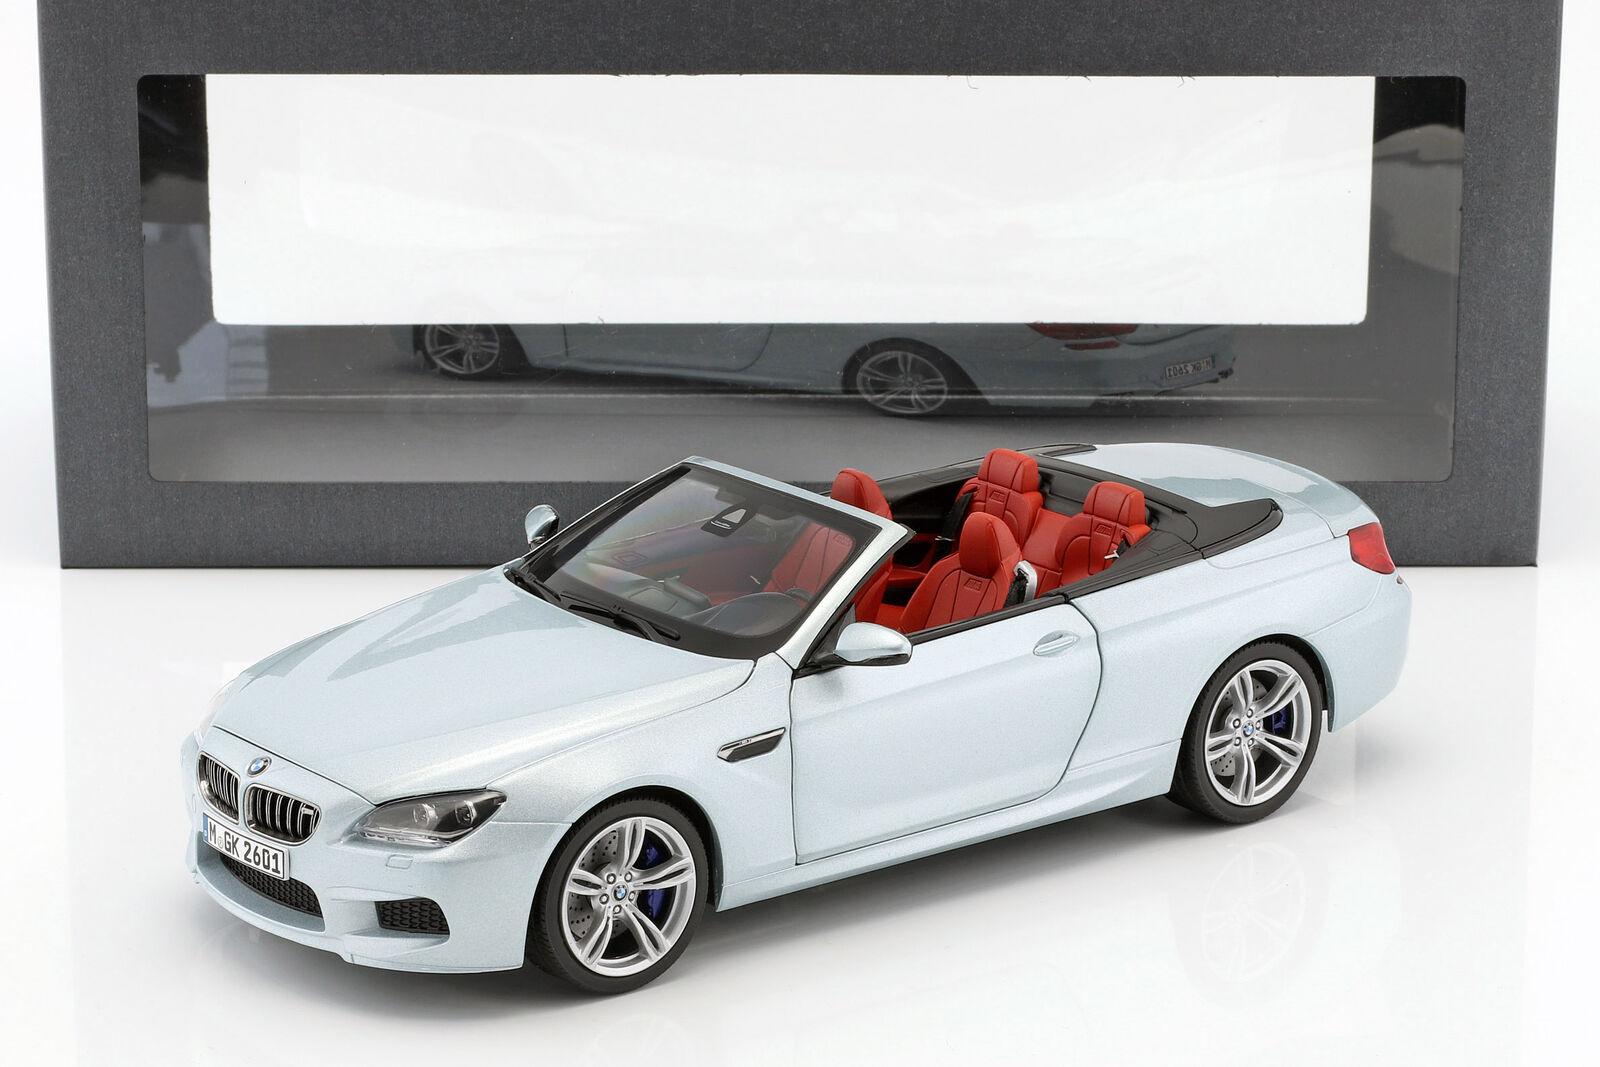 BMW M6 Converdeible platastone II Plata 1 18 Paragon Models